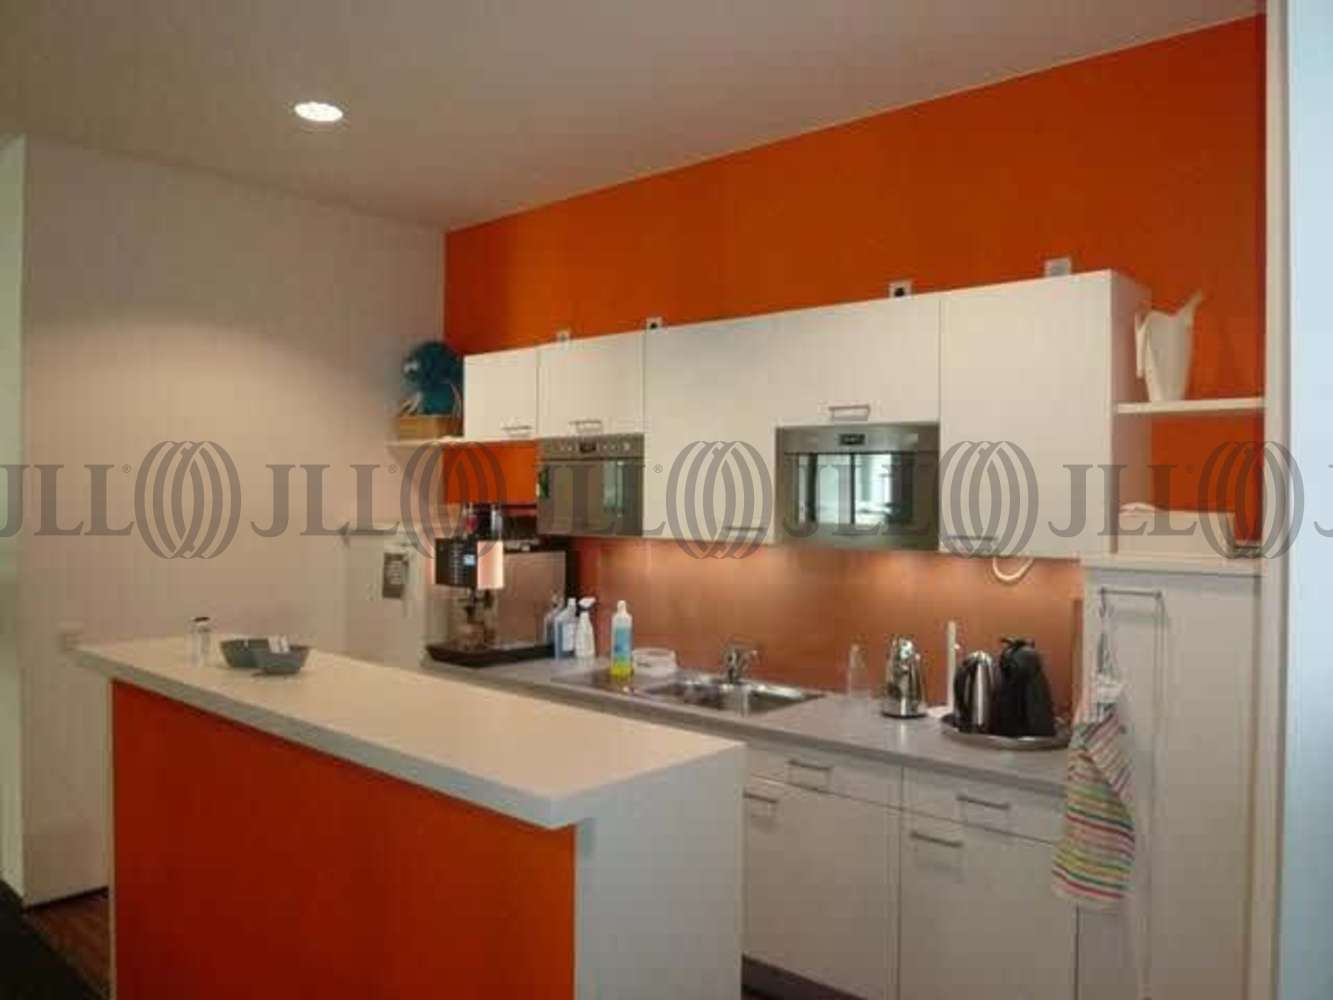 Büros Frankfurt am main, 60314 - Büro - Frankfurt am Main, Ostend - F1313 - 9410753